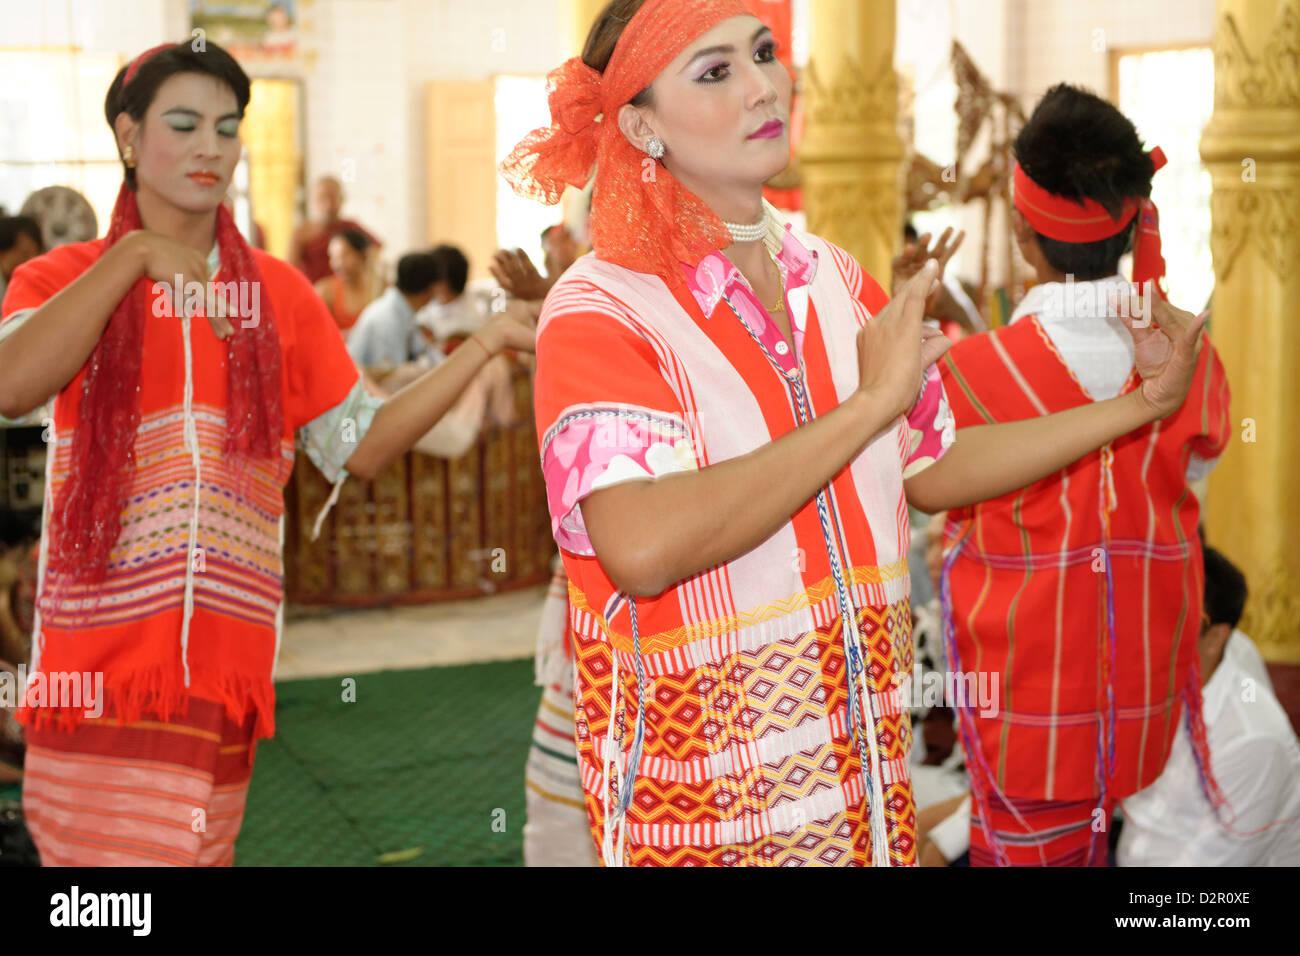 Festival of Ko Myo Shin, the most important nats (spirits) of the national pantheon, Pyin U Lwi, Mandalay Division, - Stock Image